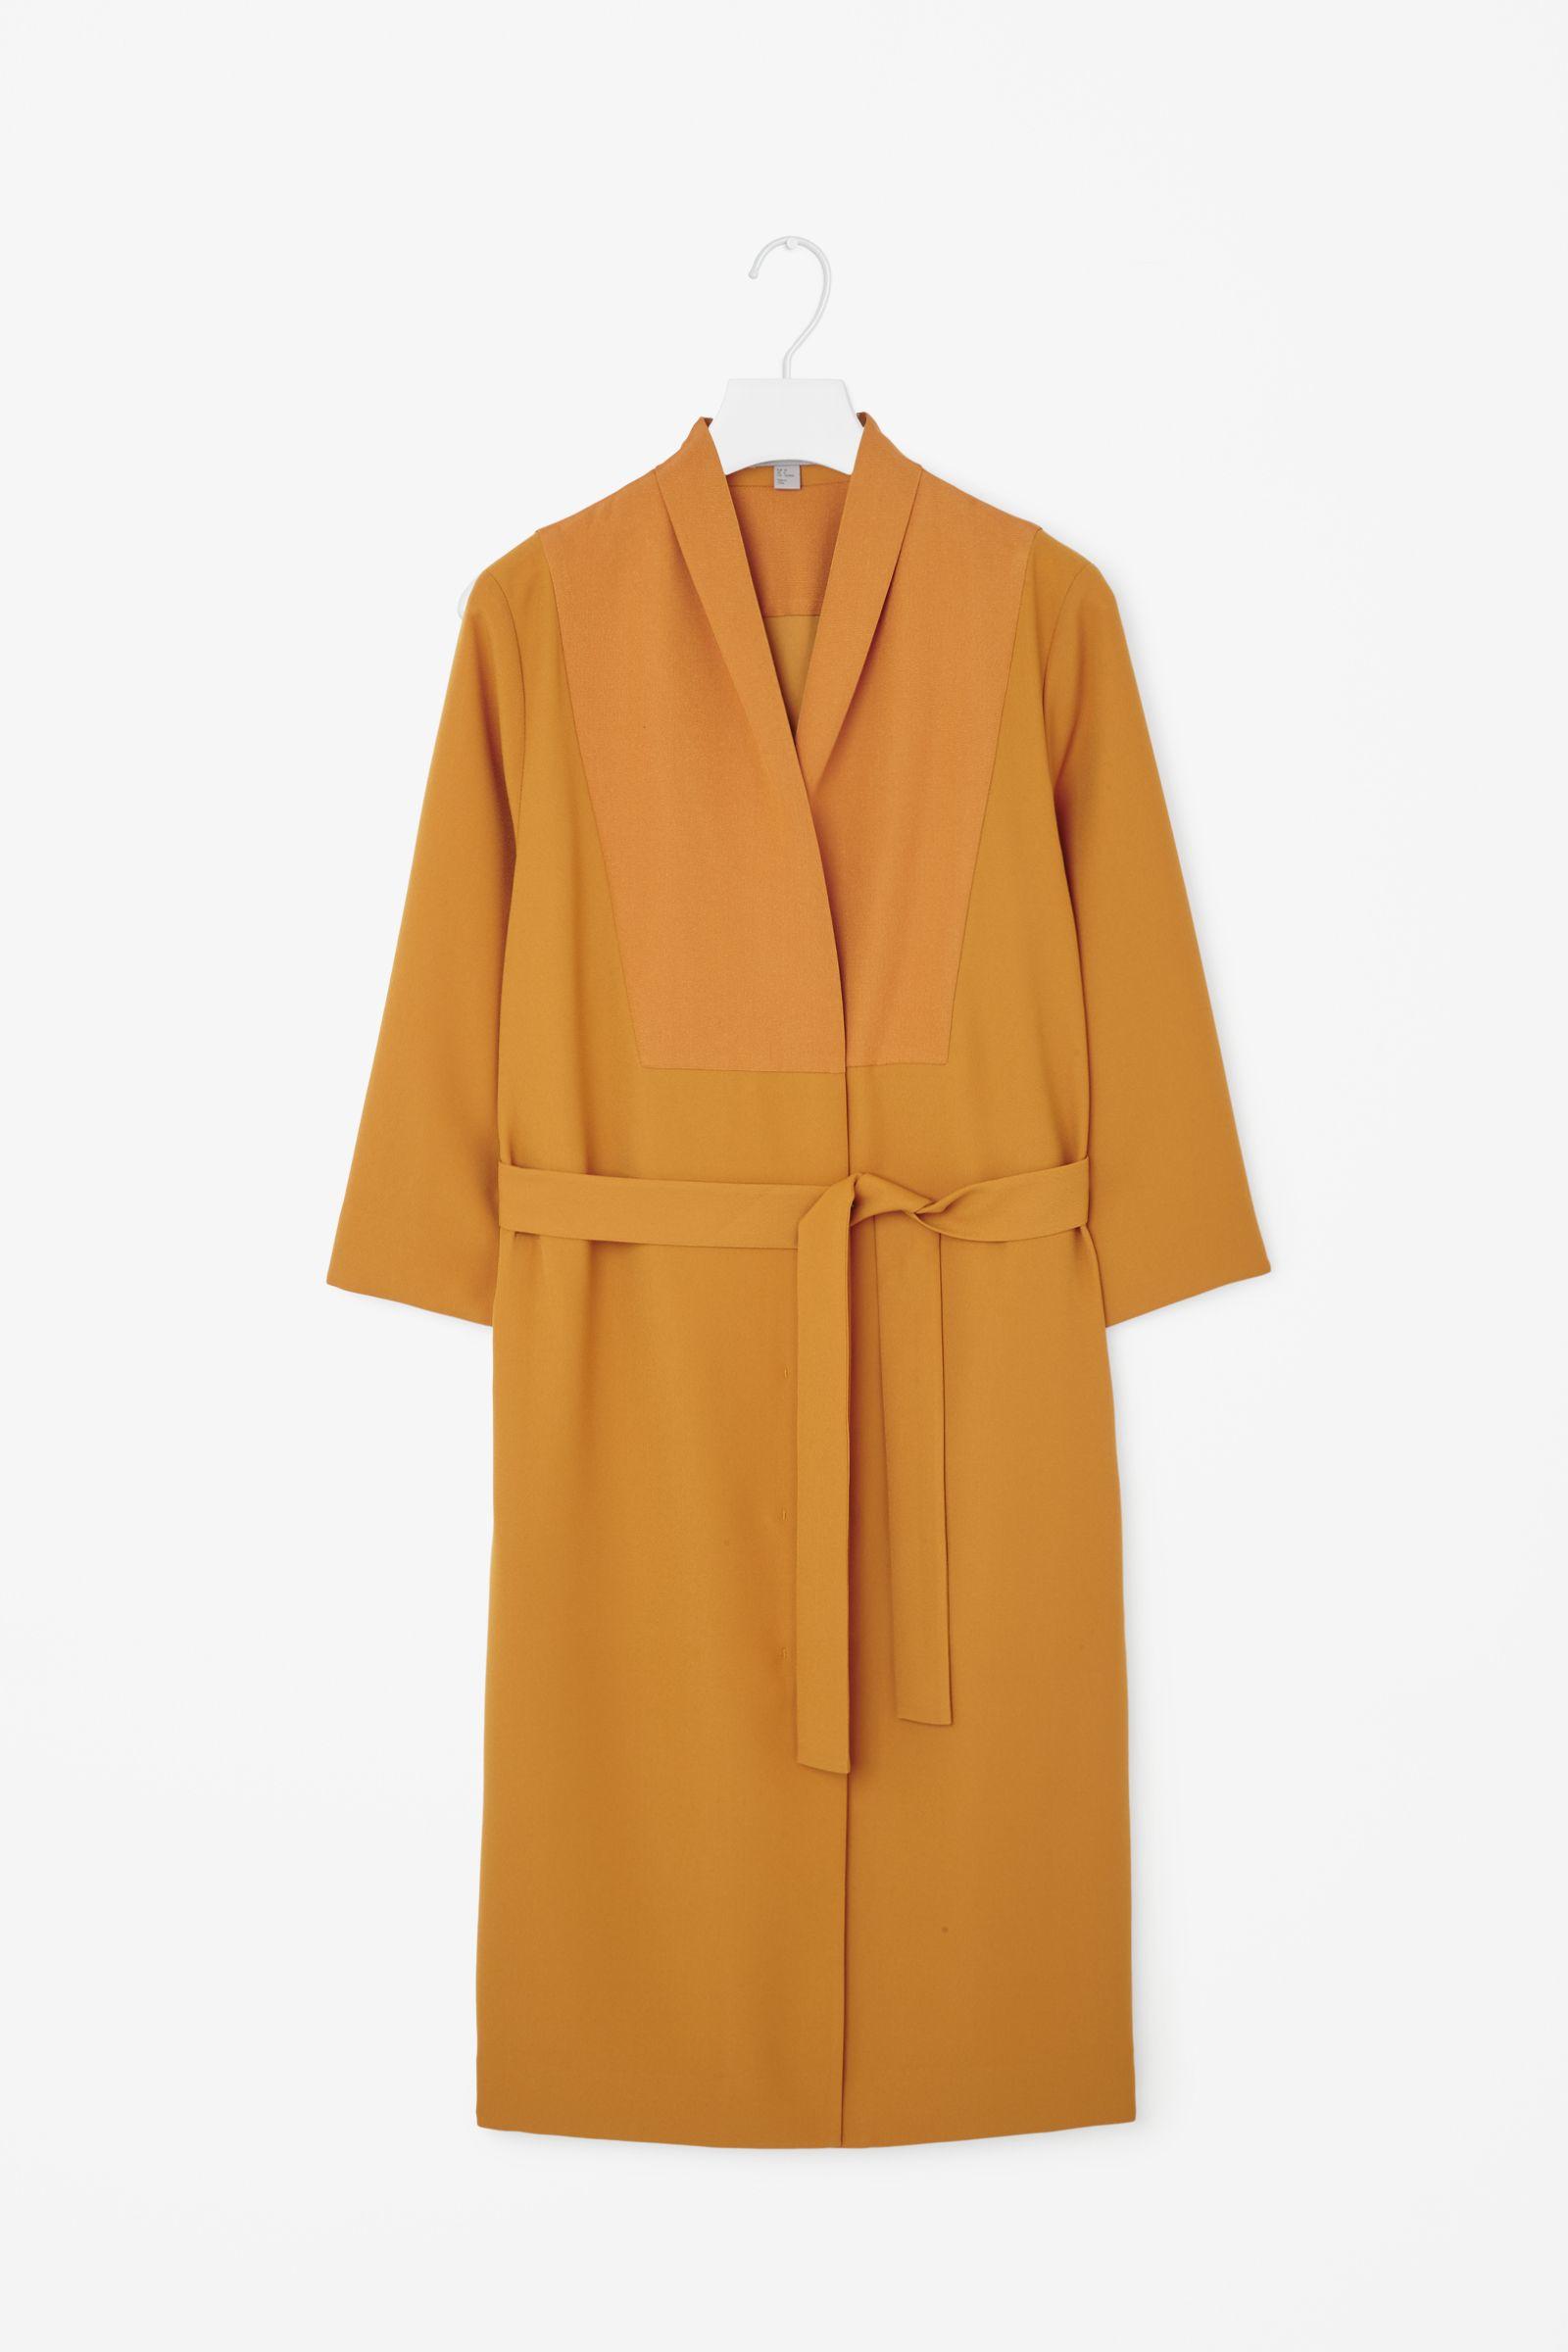 Cos Long Blazer Dress In Orange Egg Yolk Lyst